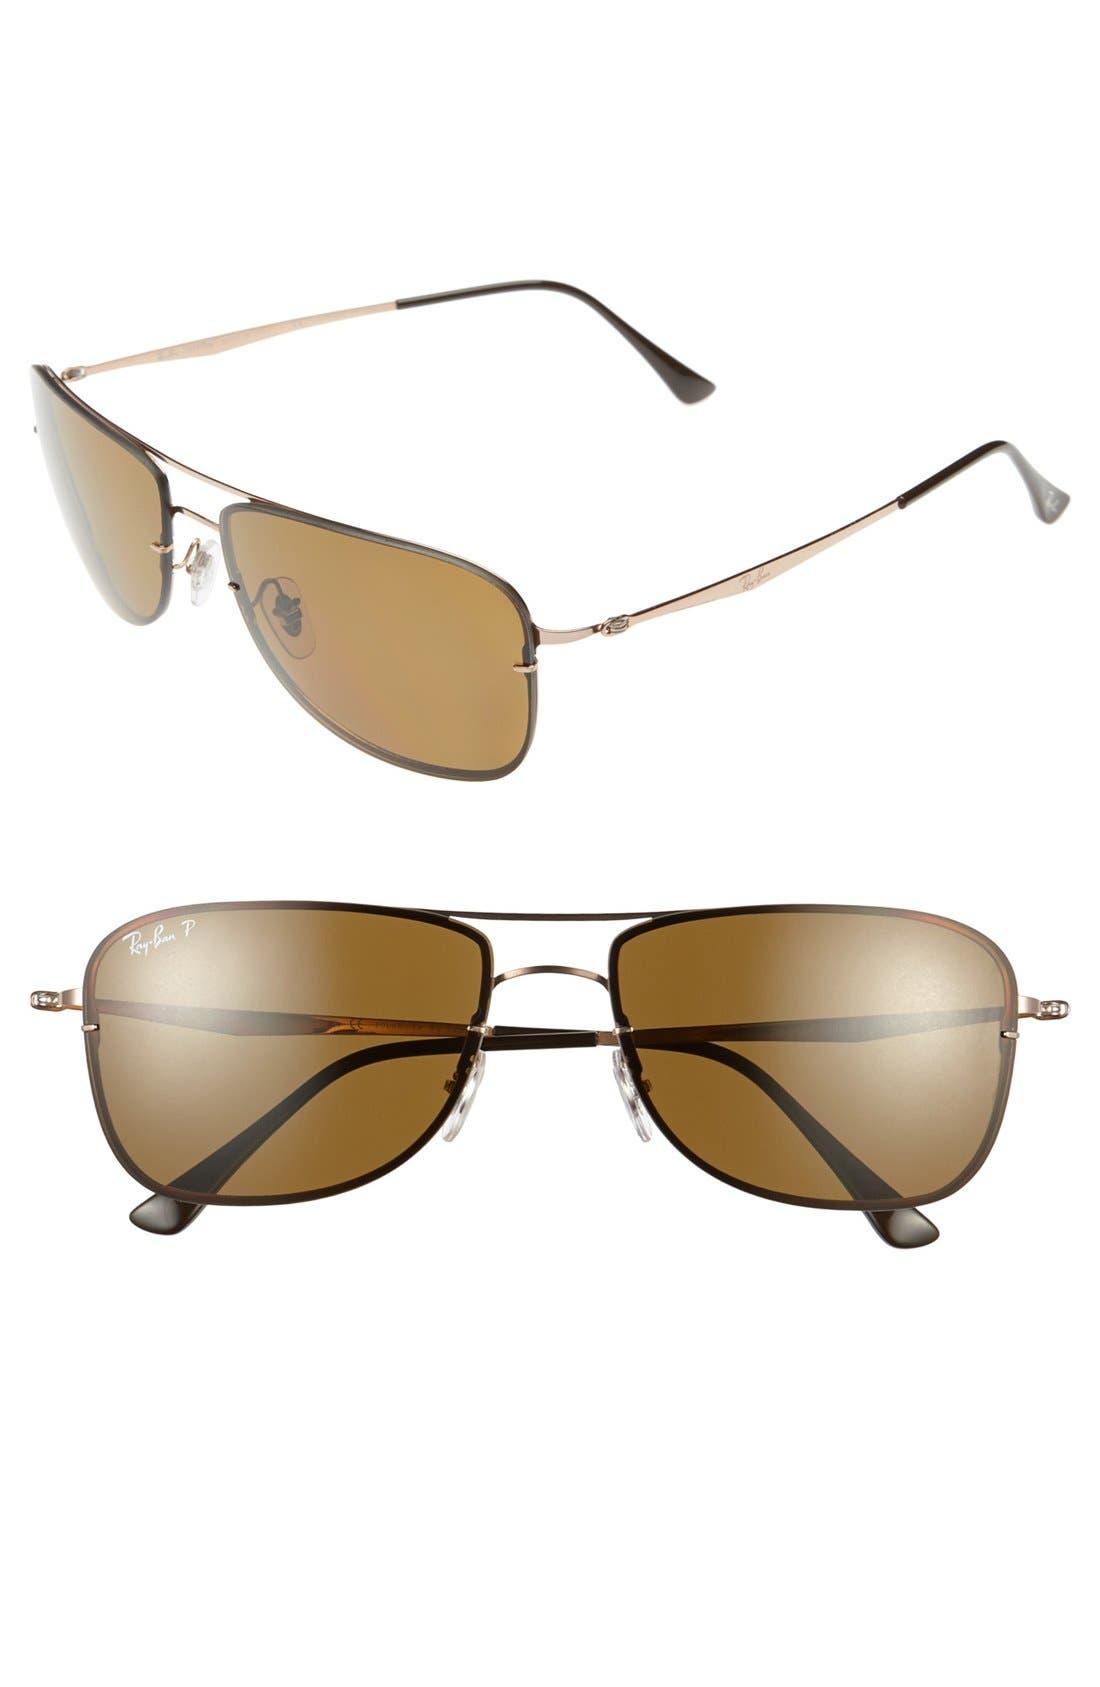 Main Image - Ray-Ban 'Pilot Aviator' Polarized Sunglasses